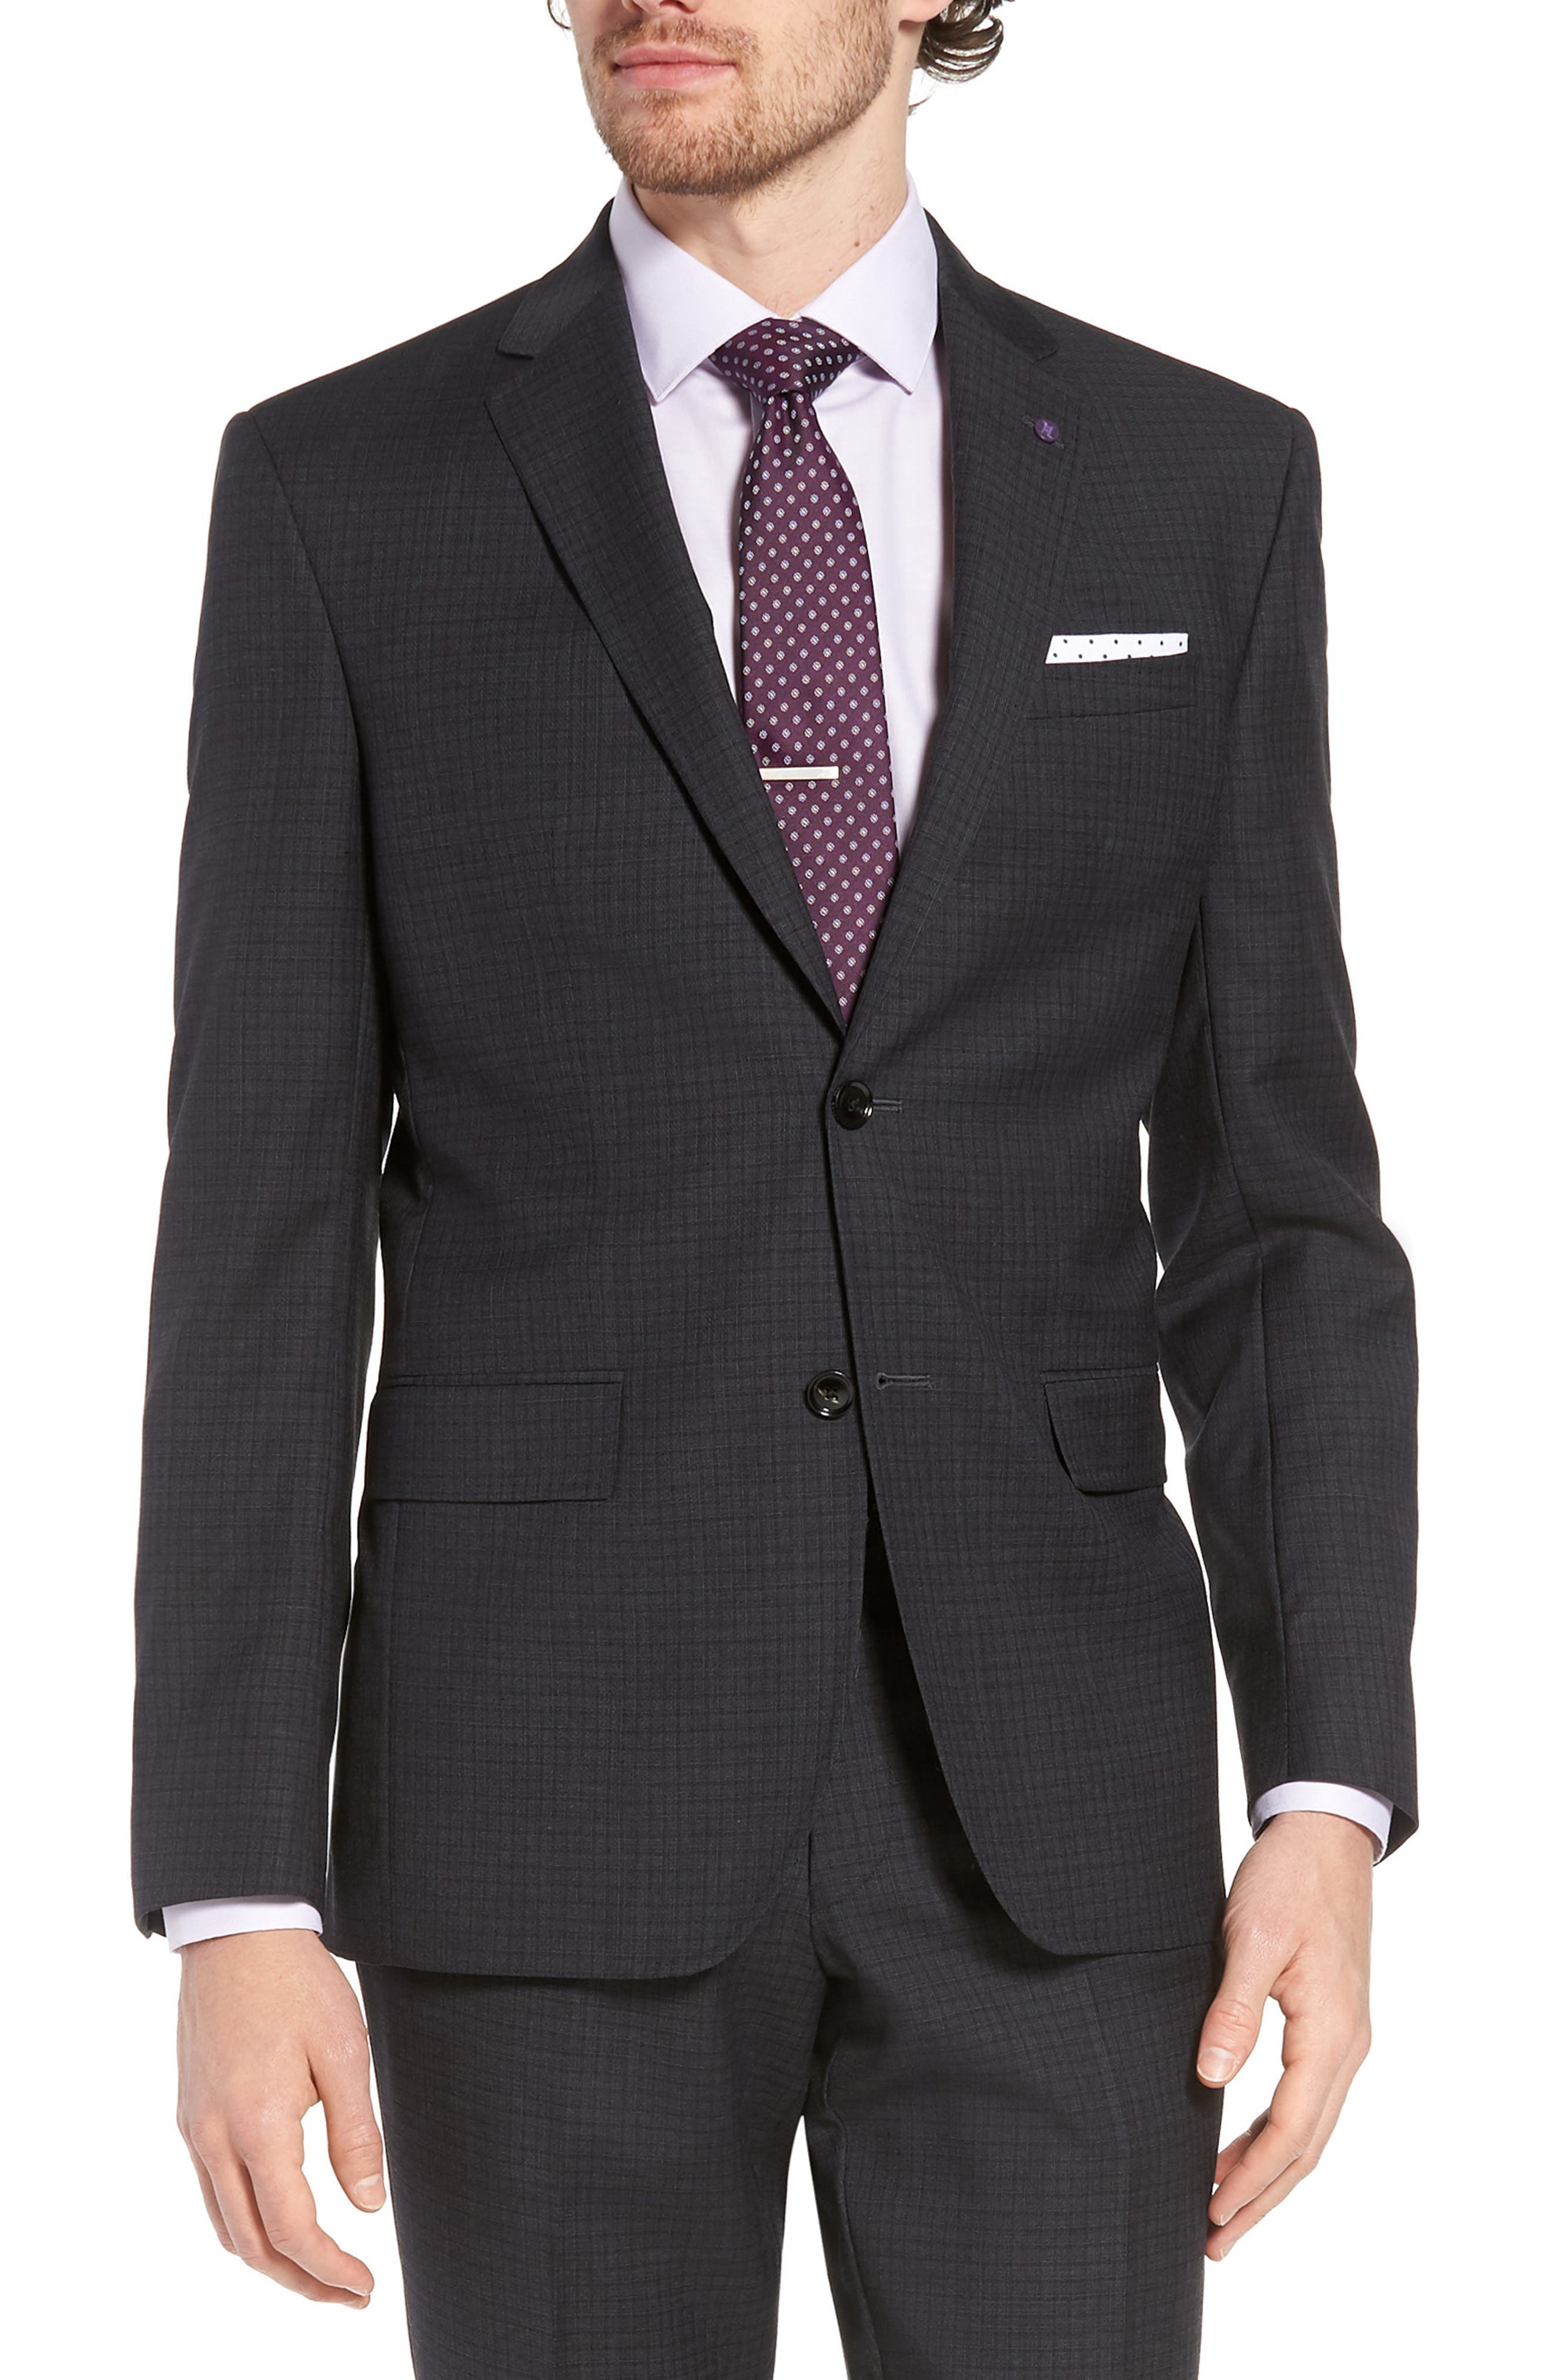 Jay Trim Fit Check Wool Suit,                             Alternate thumbnail 5, color,                             020